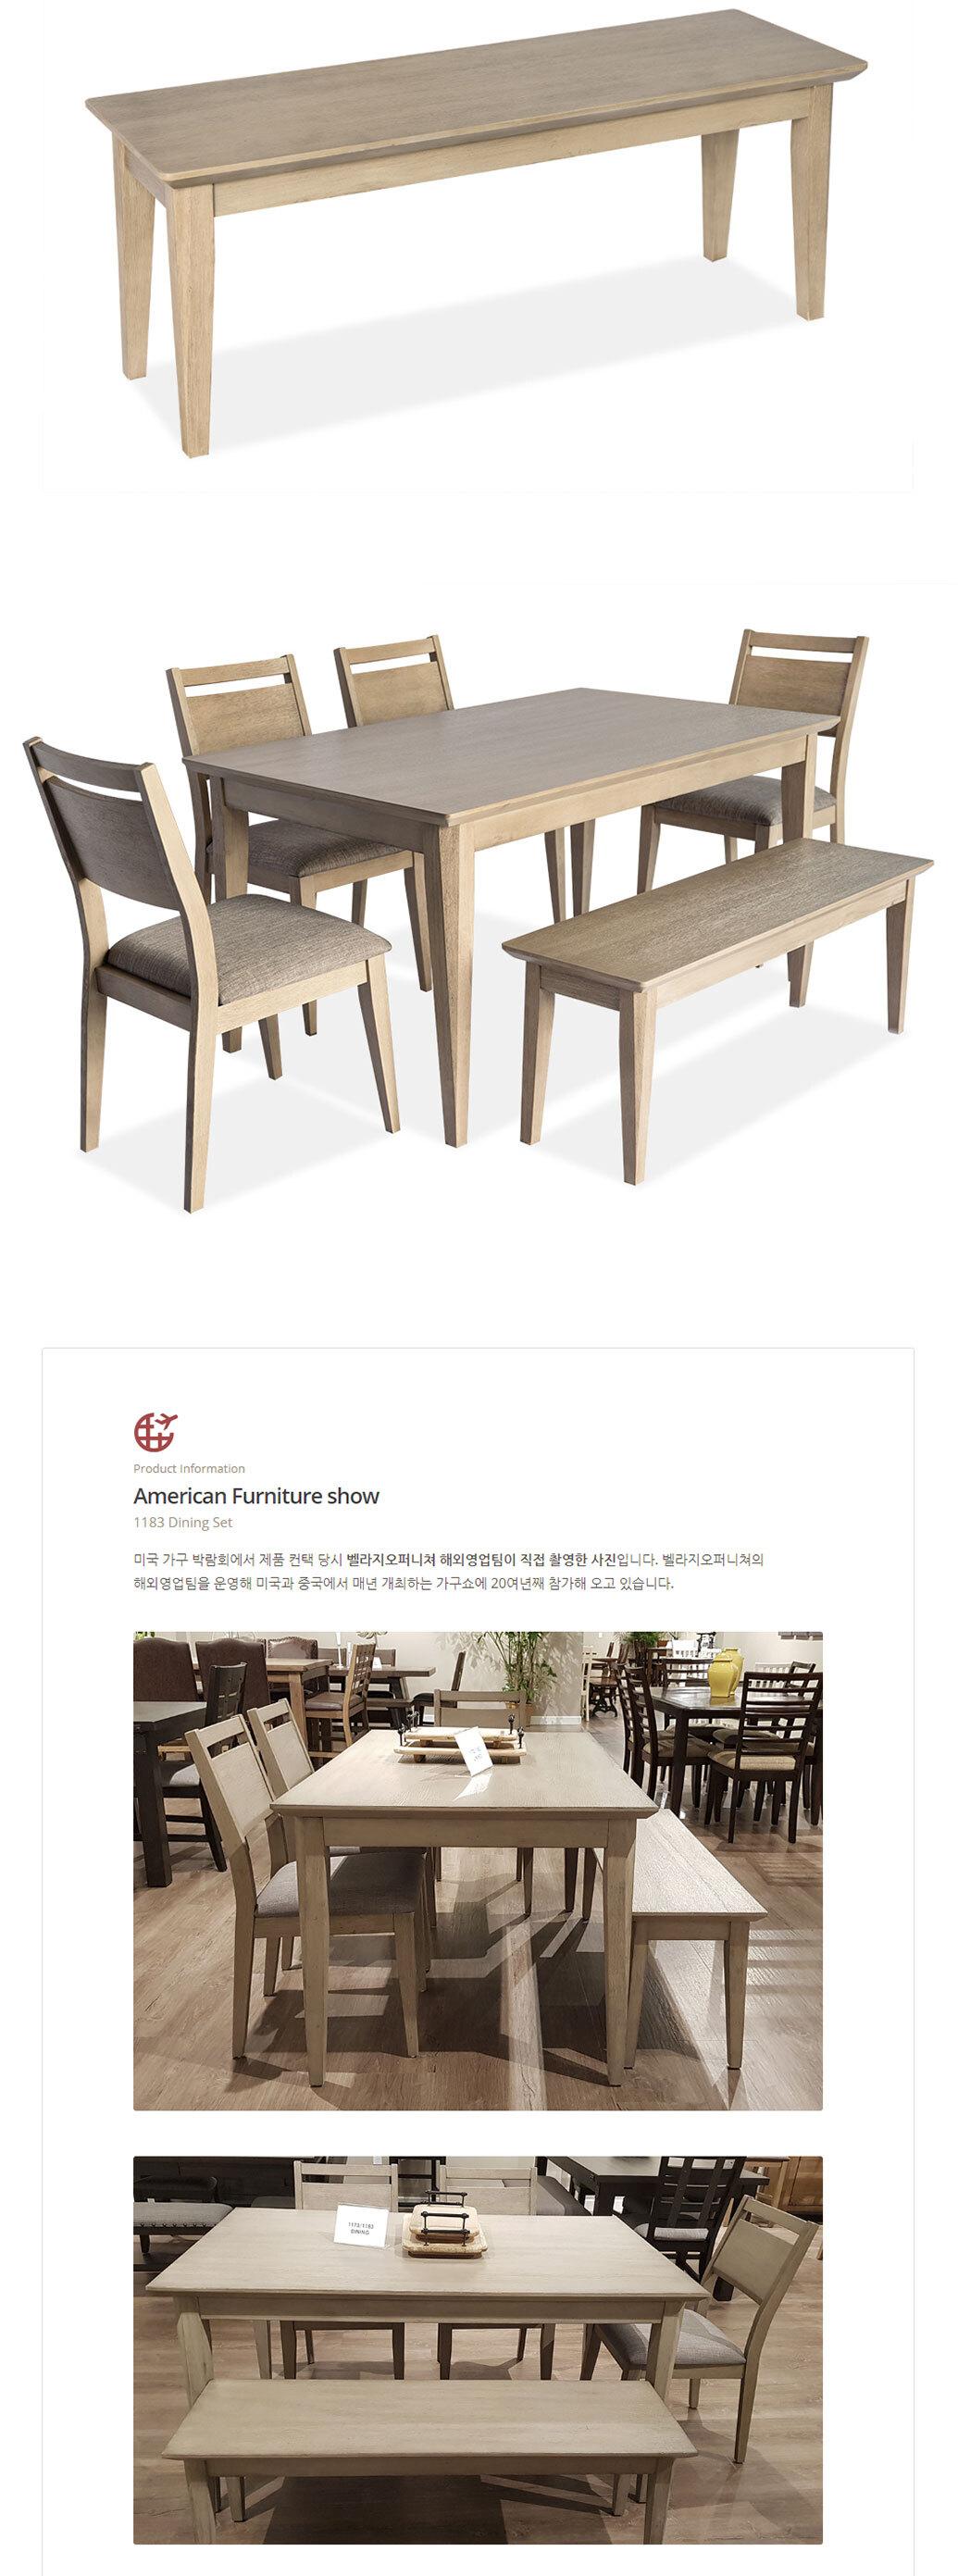 1183_dining_table_03.jpg